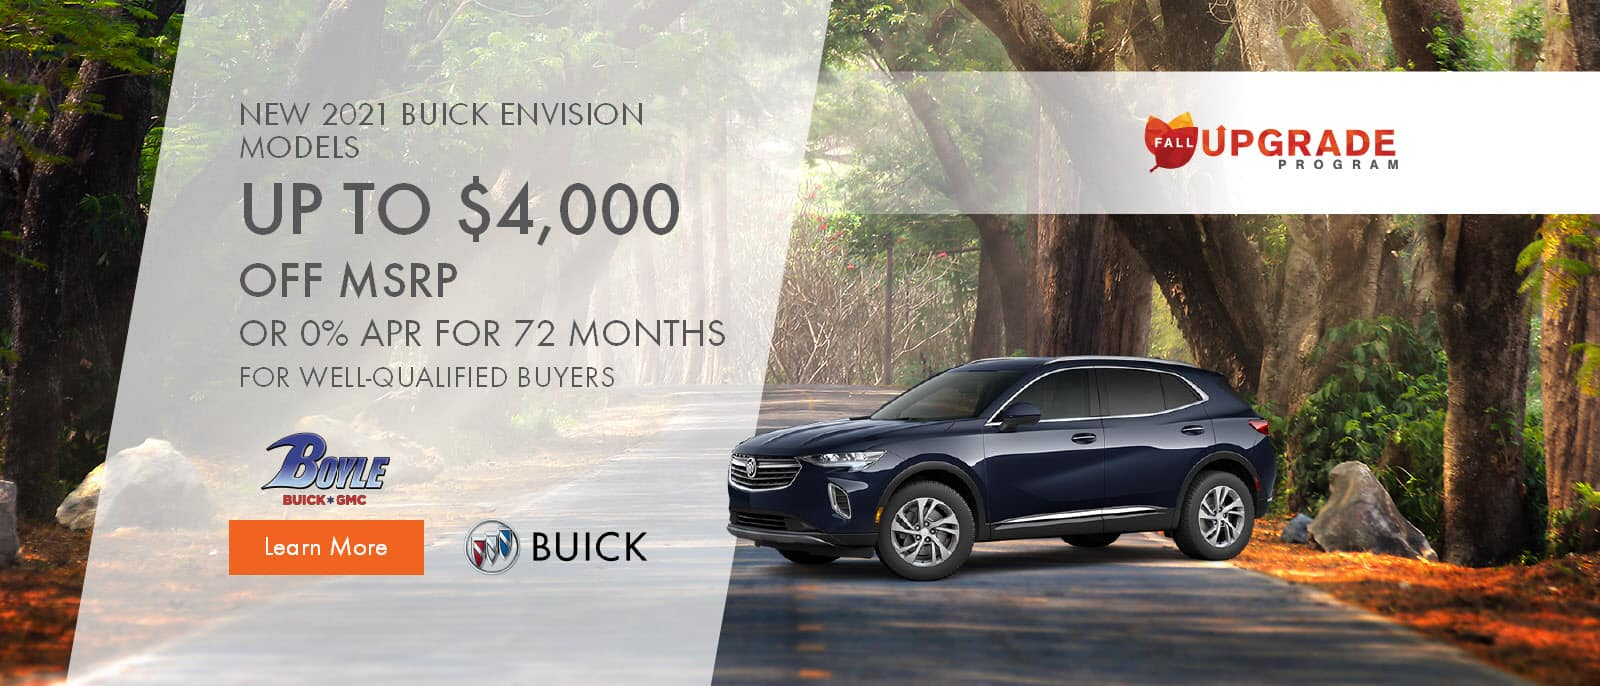 2021 Buick Envision Models